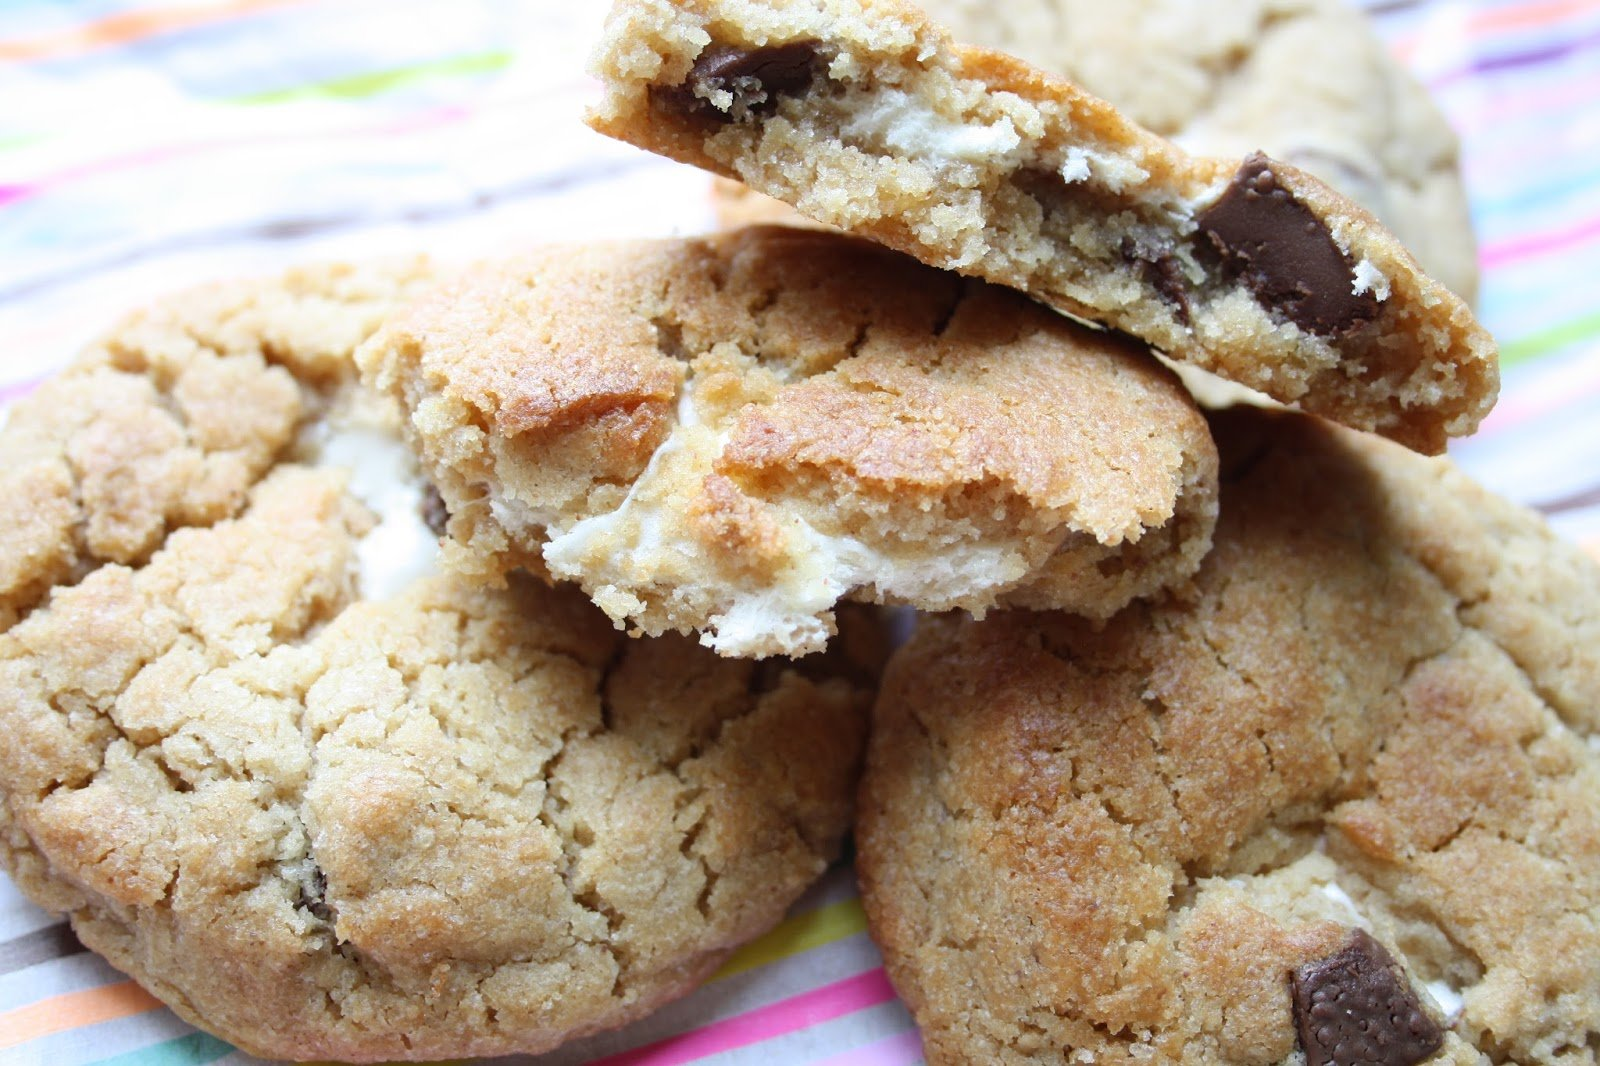 Amerikanische Cookies - saftig in der Mitte